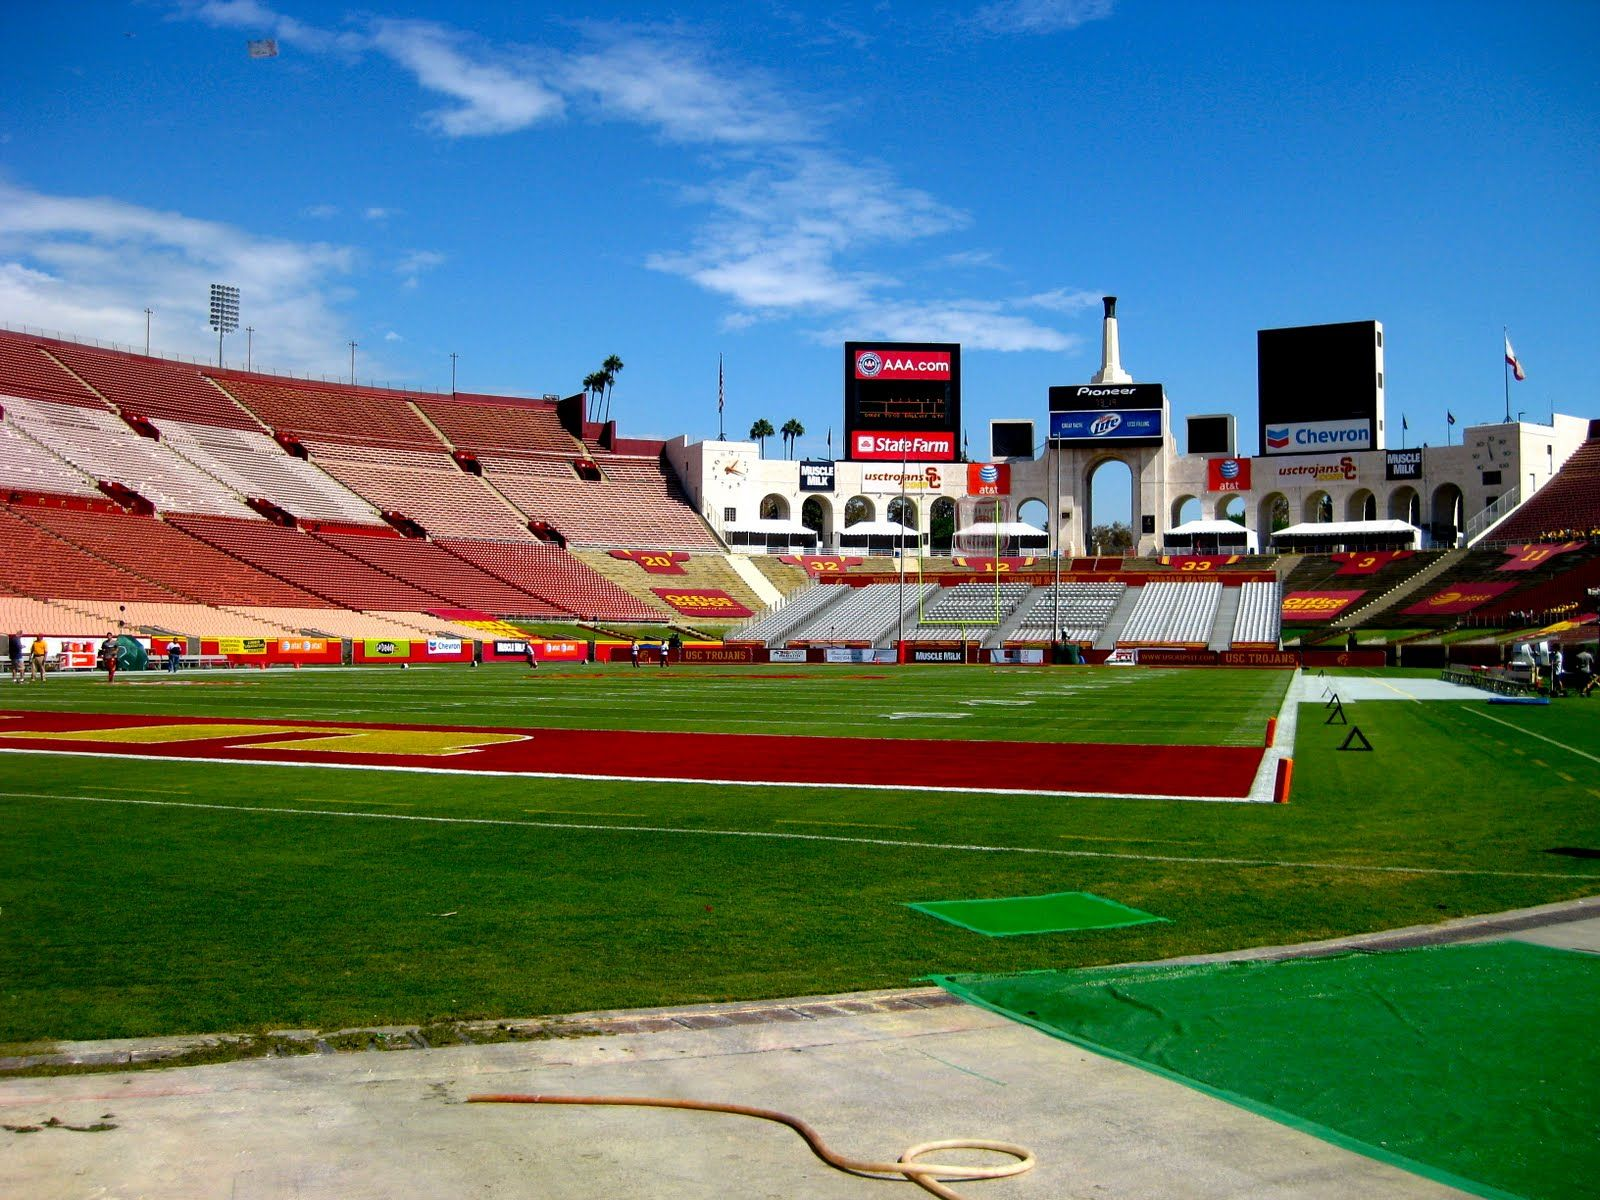 Our Stadium Usc Trojans Football Fighton Usc Athletics Usc